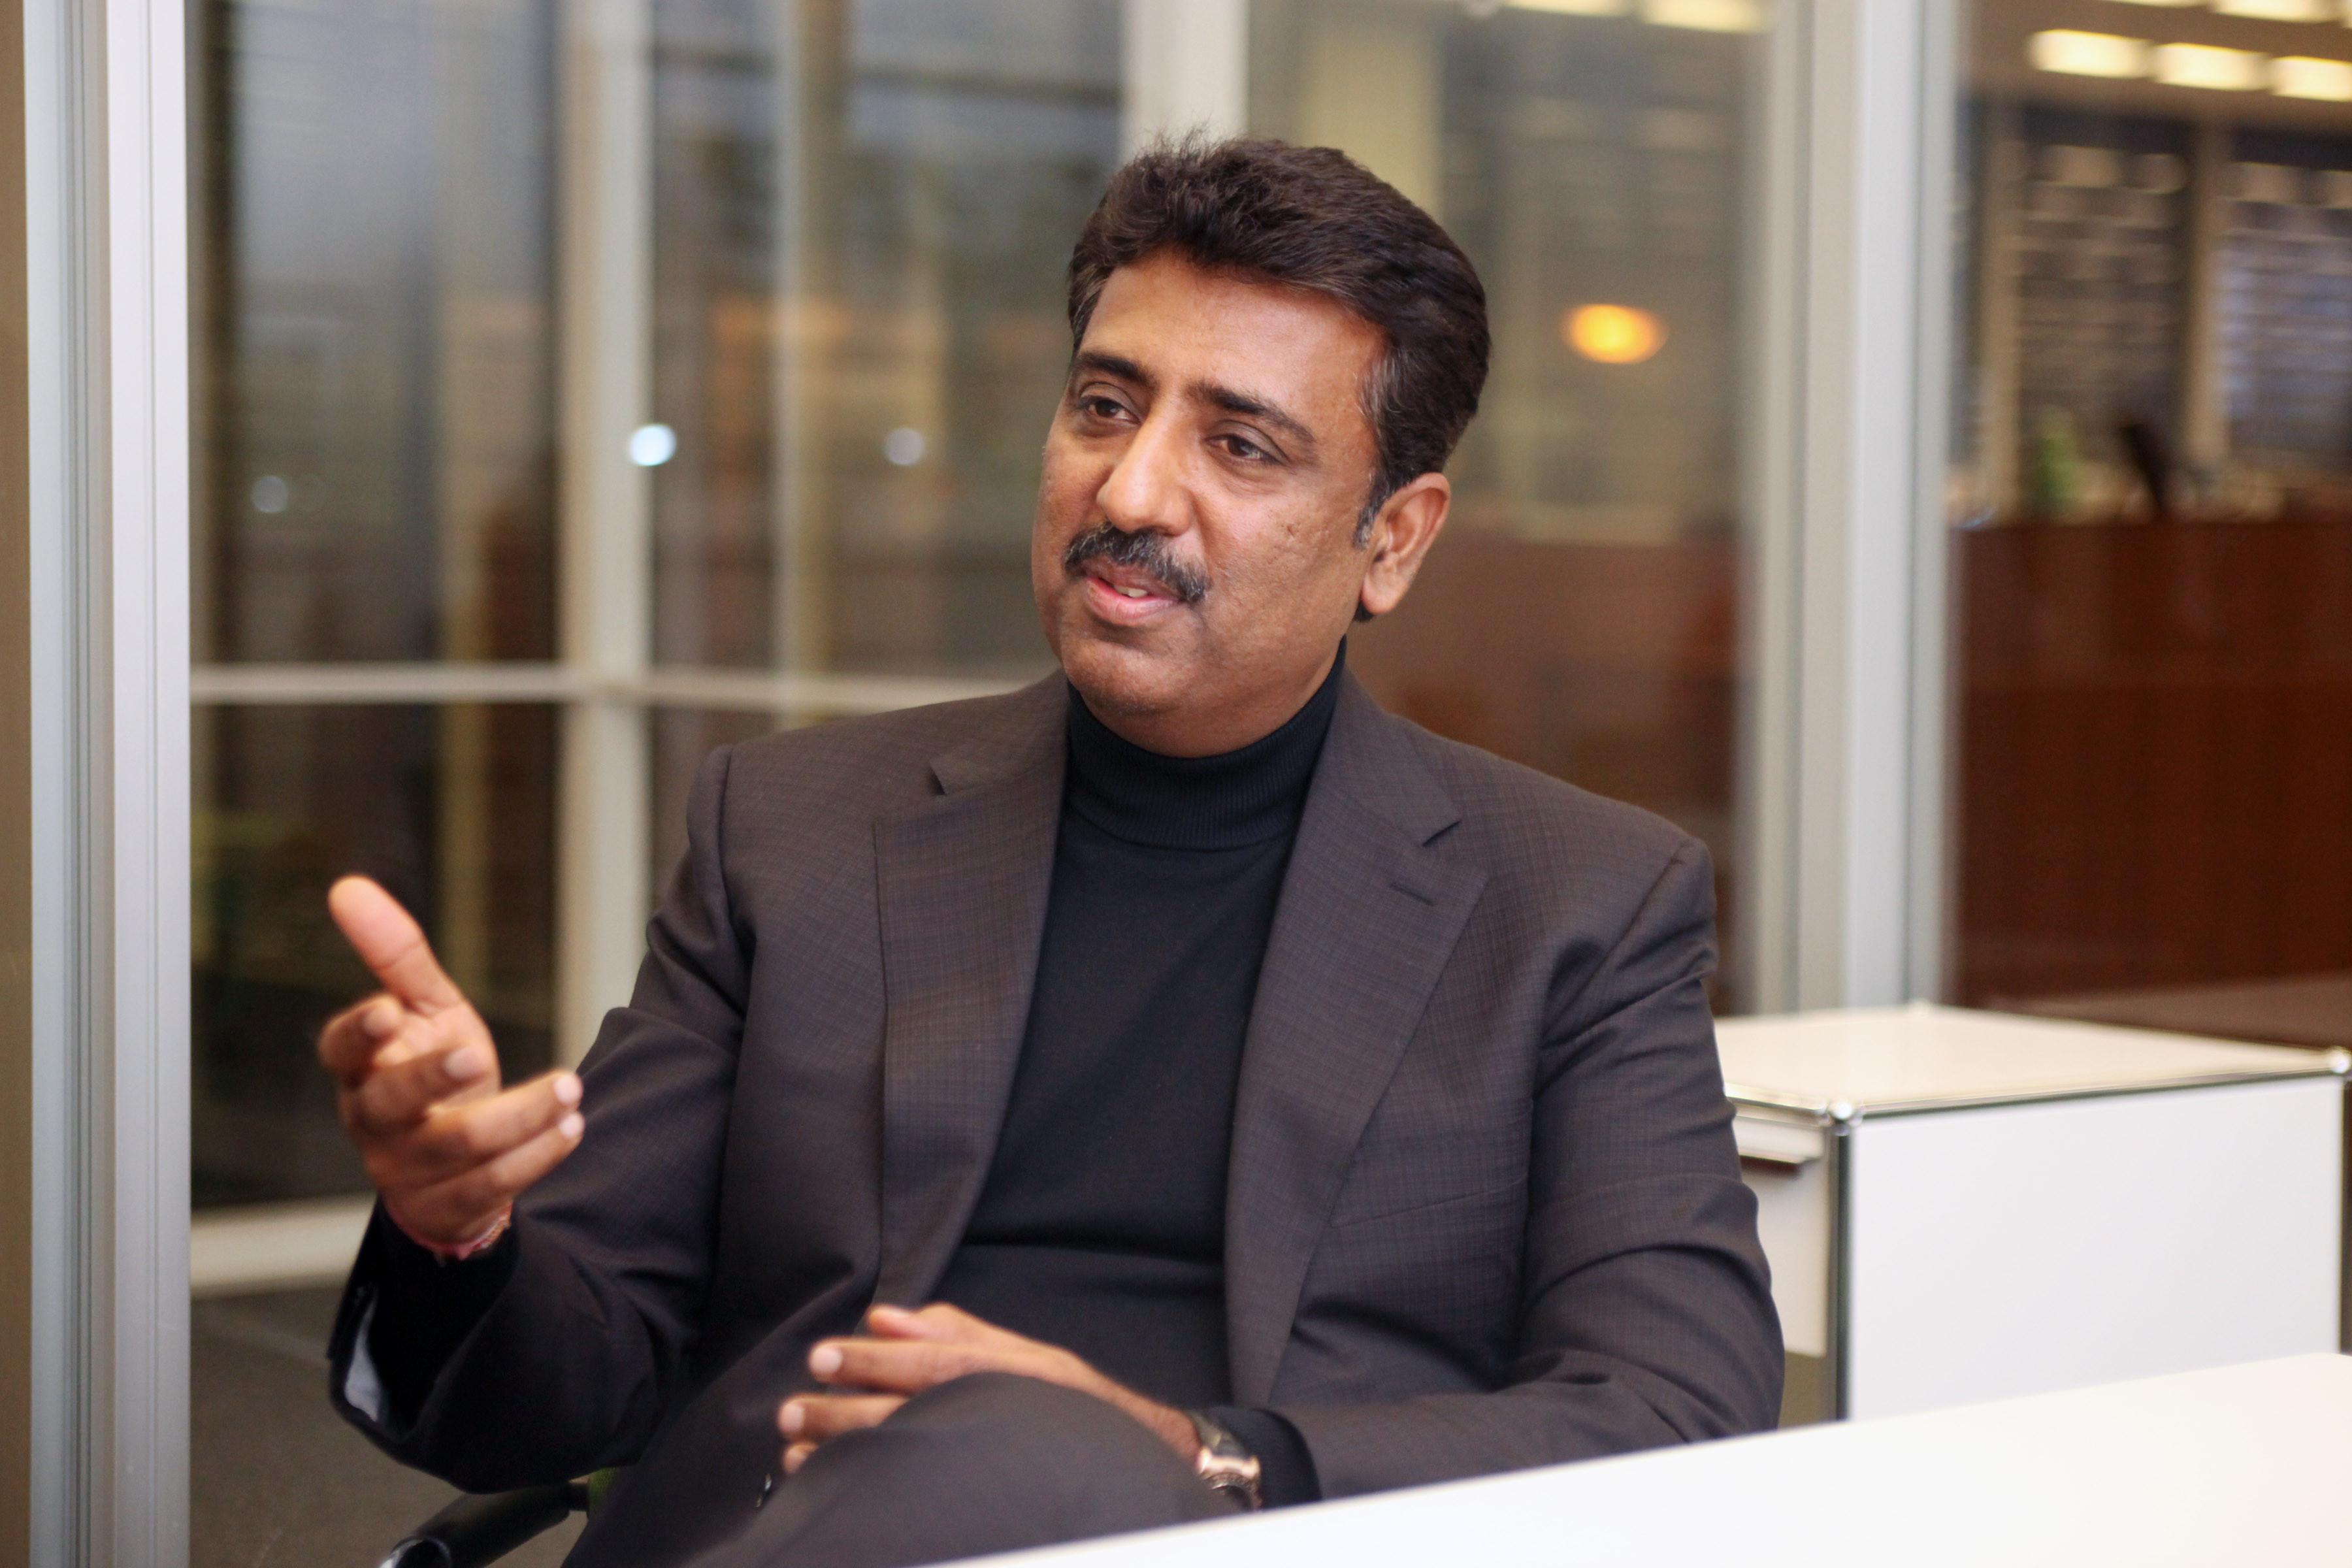 Girish Navani, CEO of eClinicalWorks